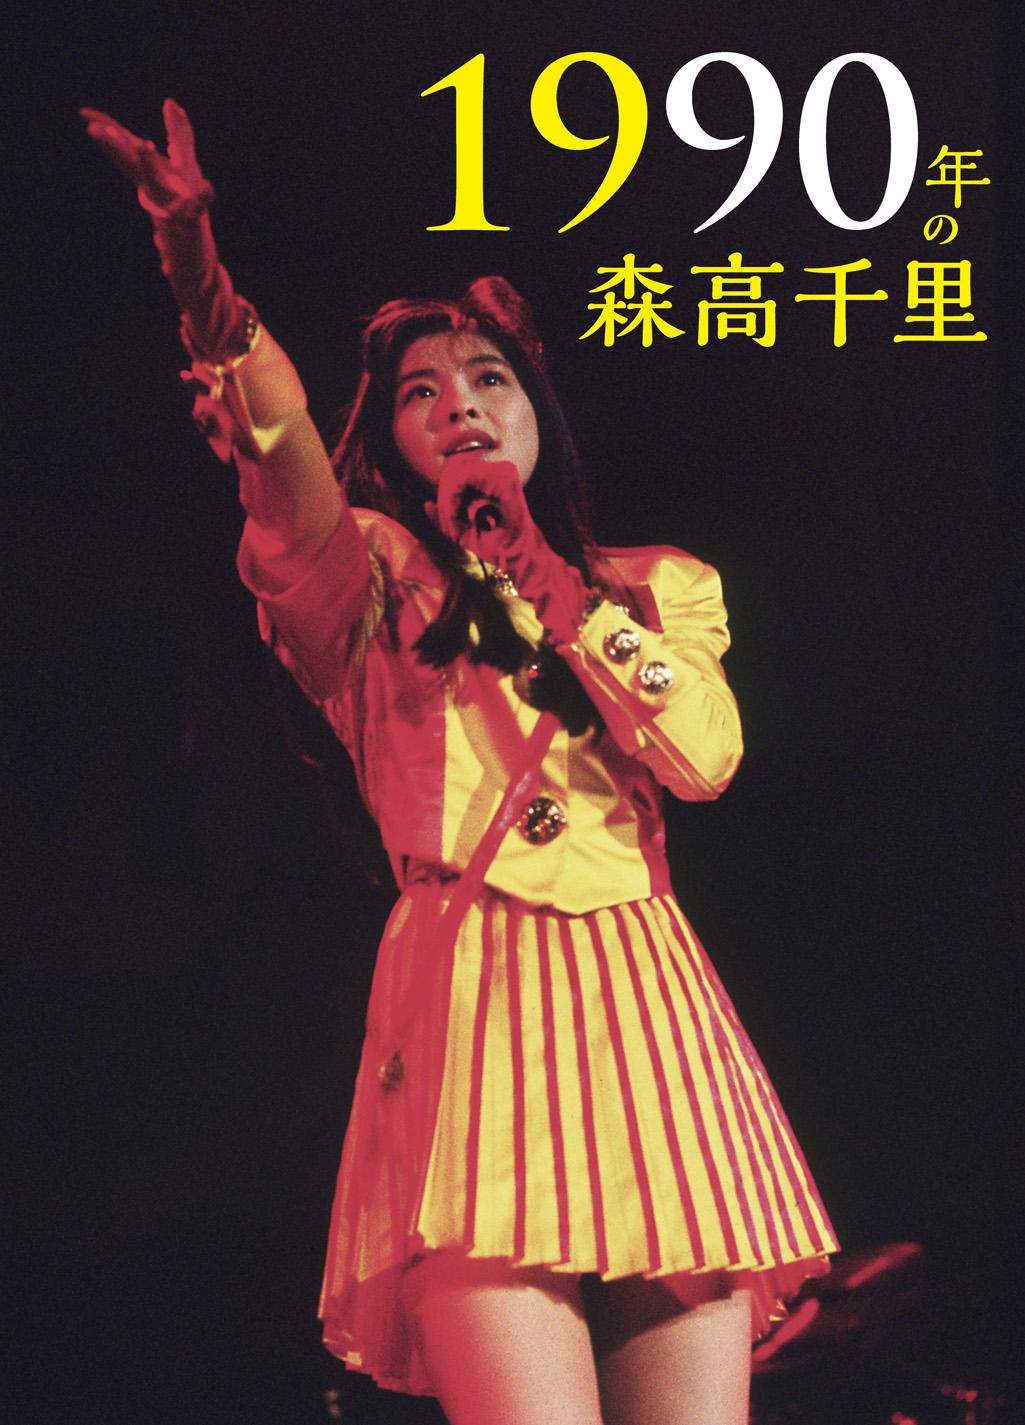 Blu-ray&DVD『1990年の森高千里』